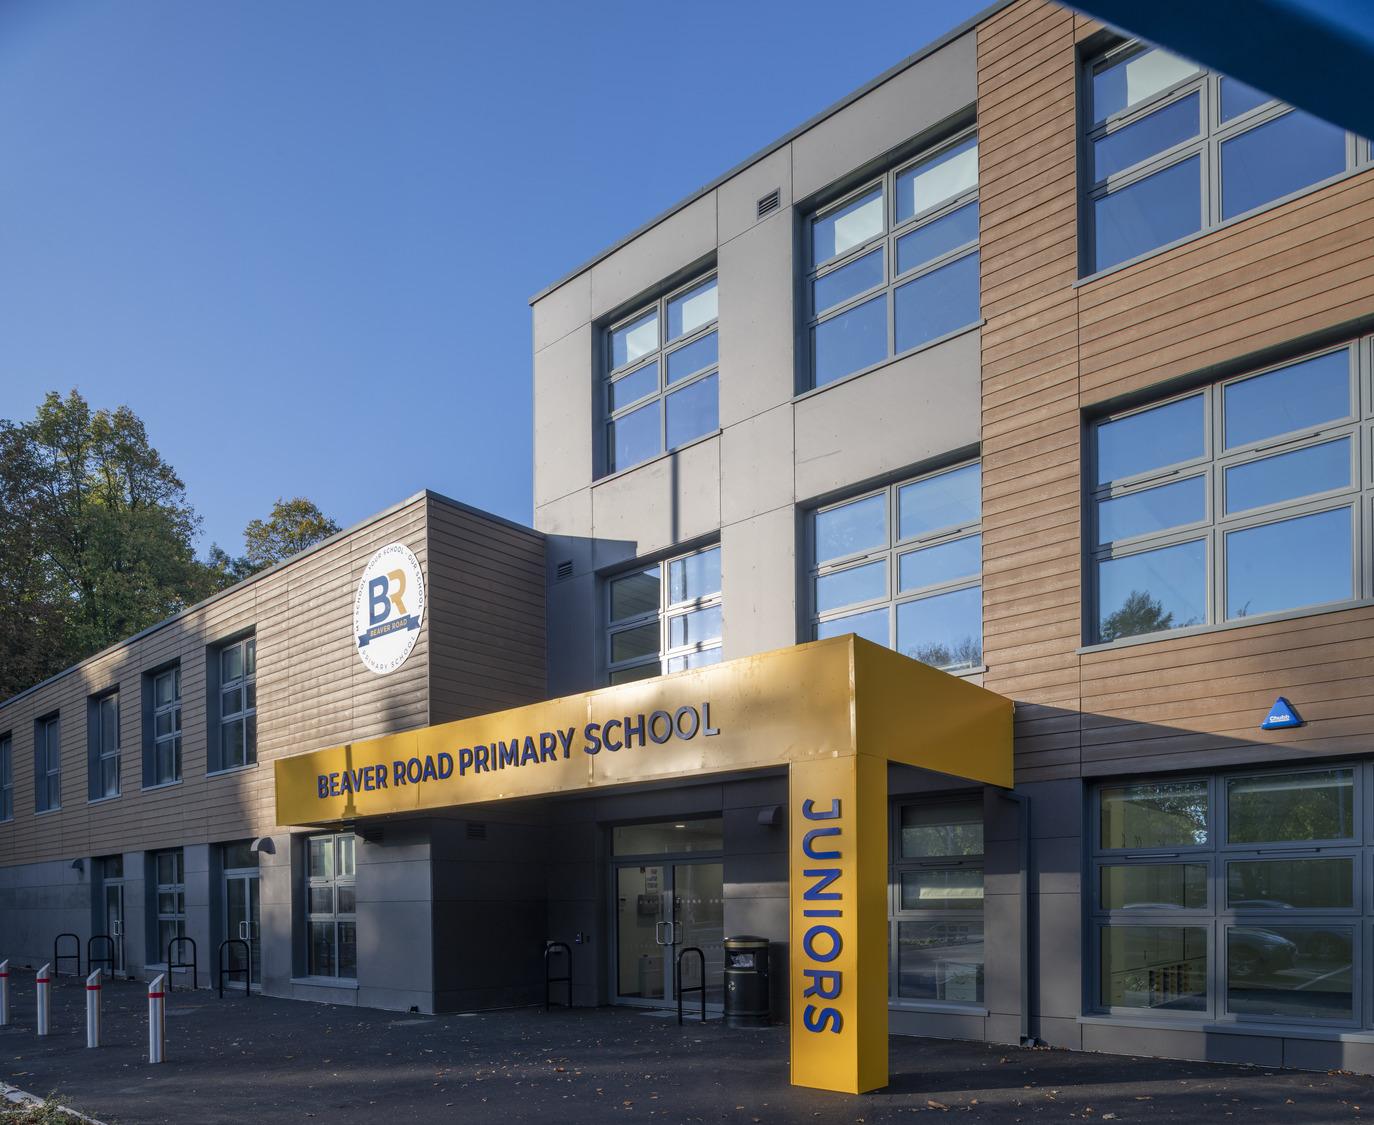 Beaver Road Primary School Manchester